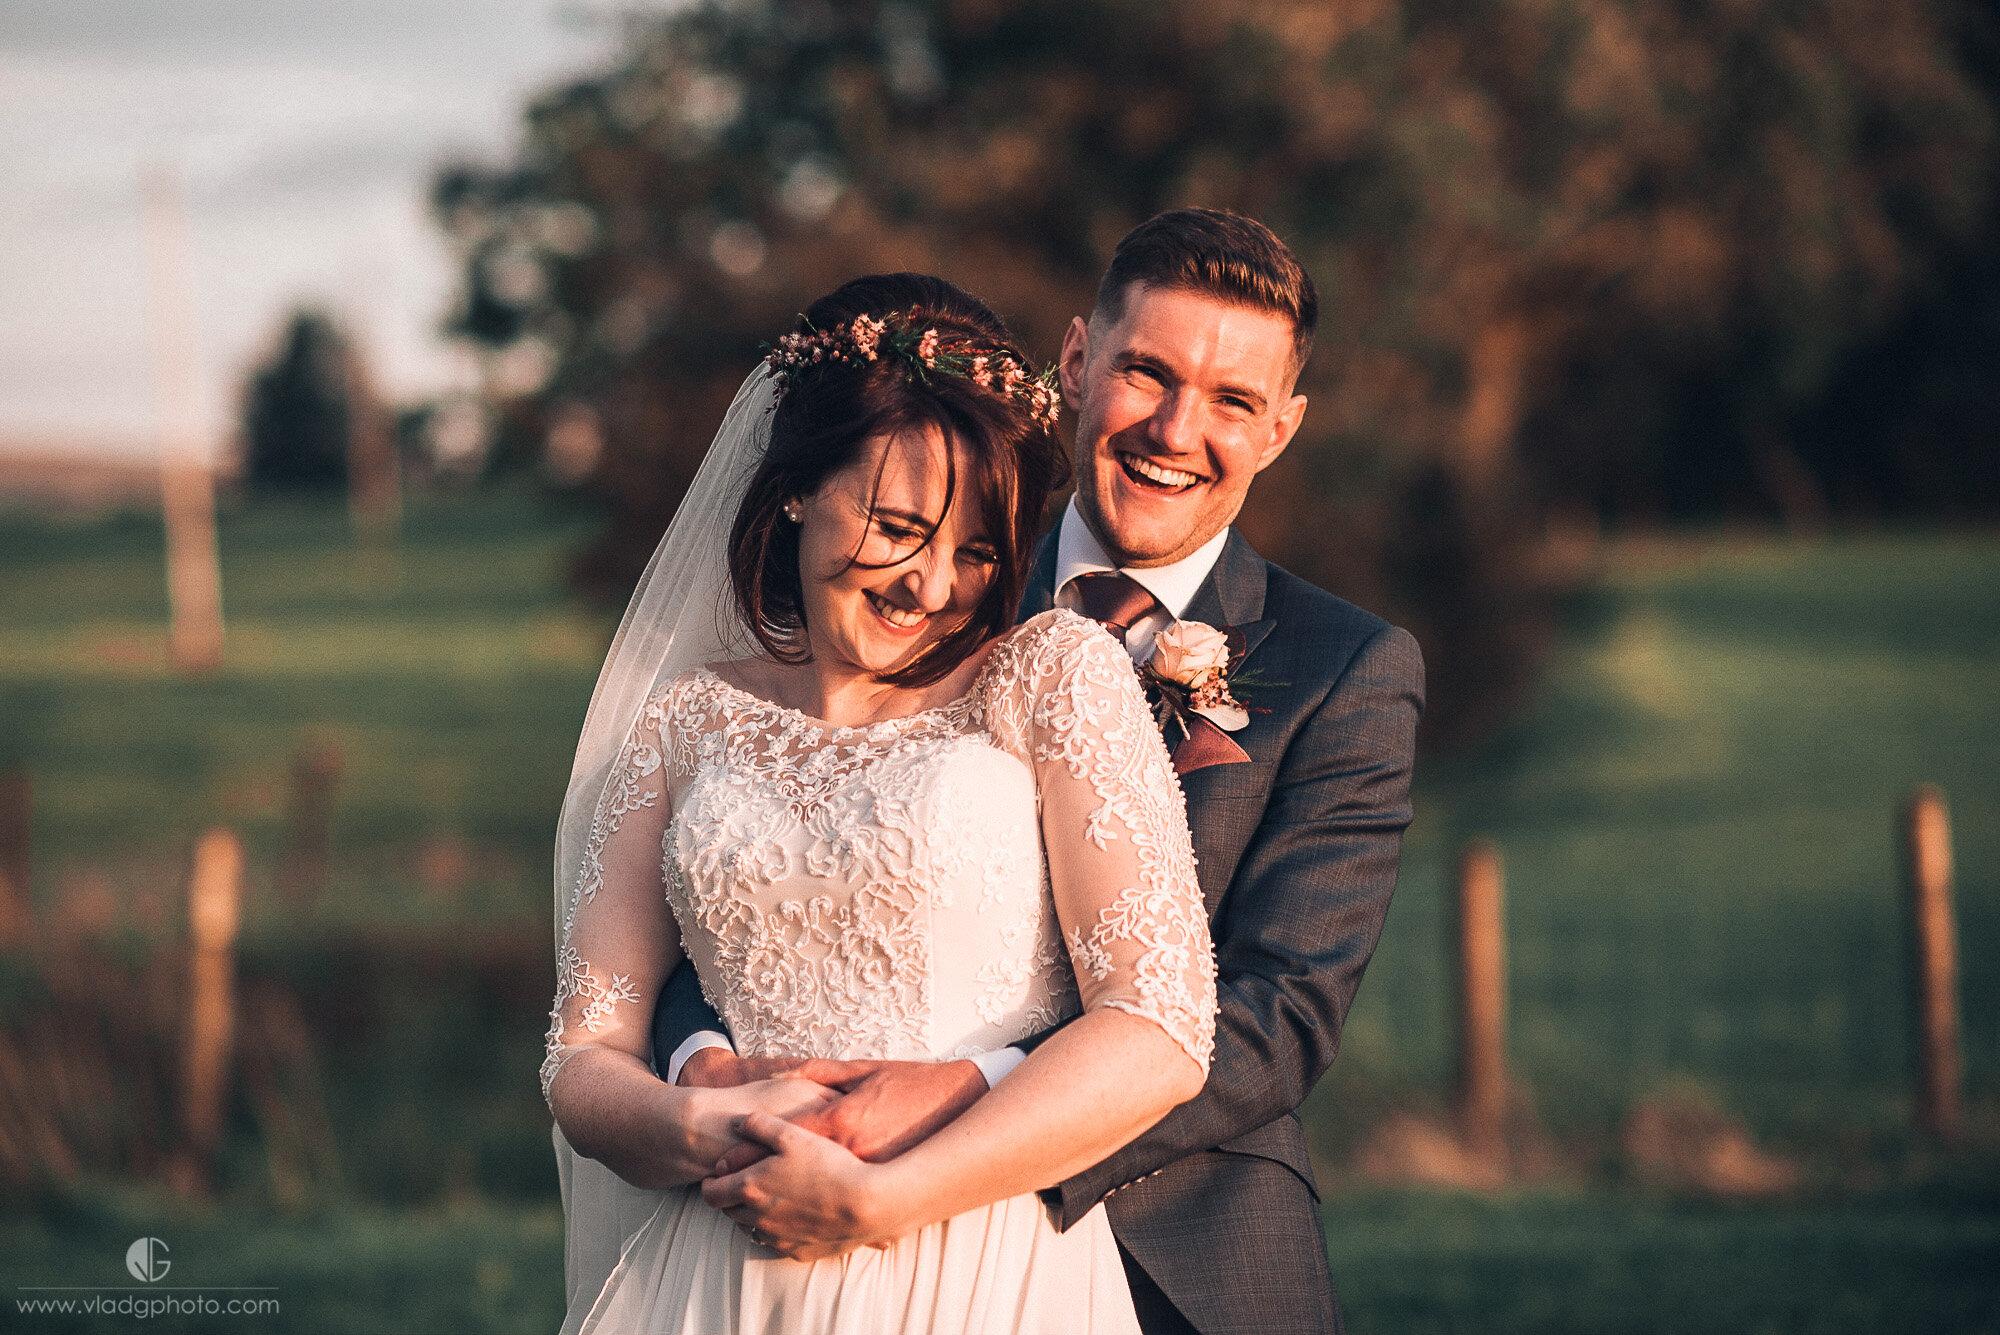 Wedding Photographer Stirk House Gisburn_5.jpg